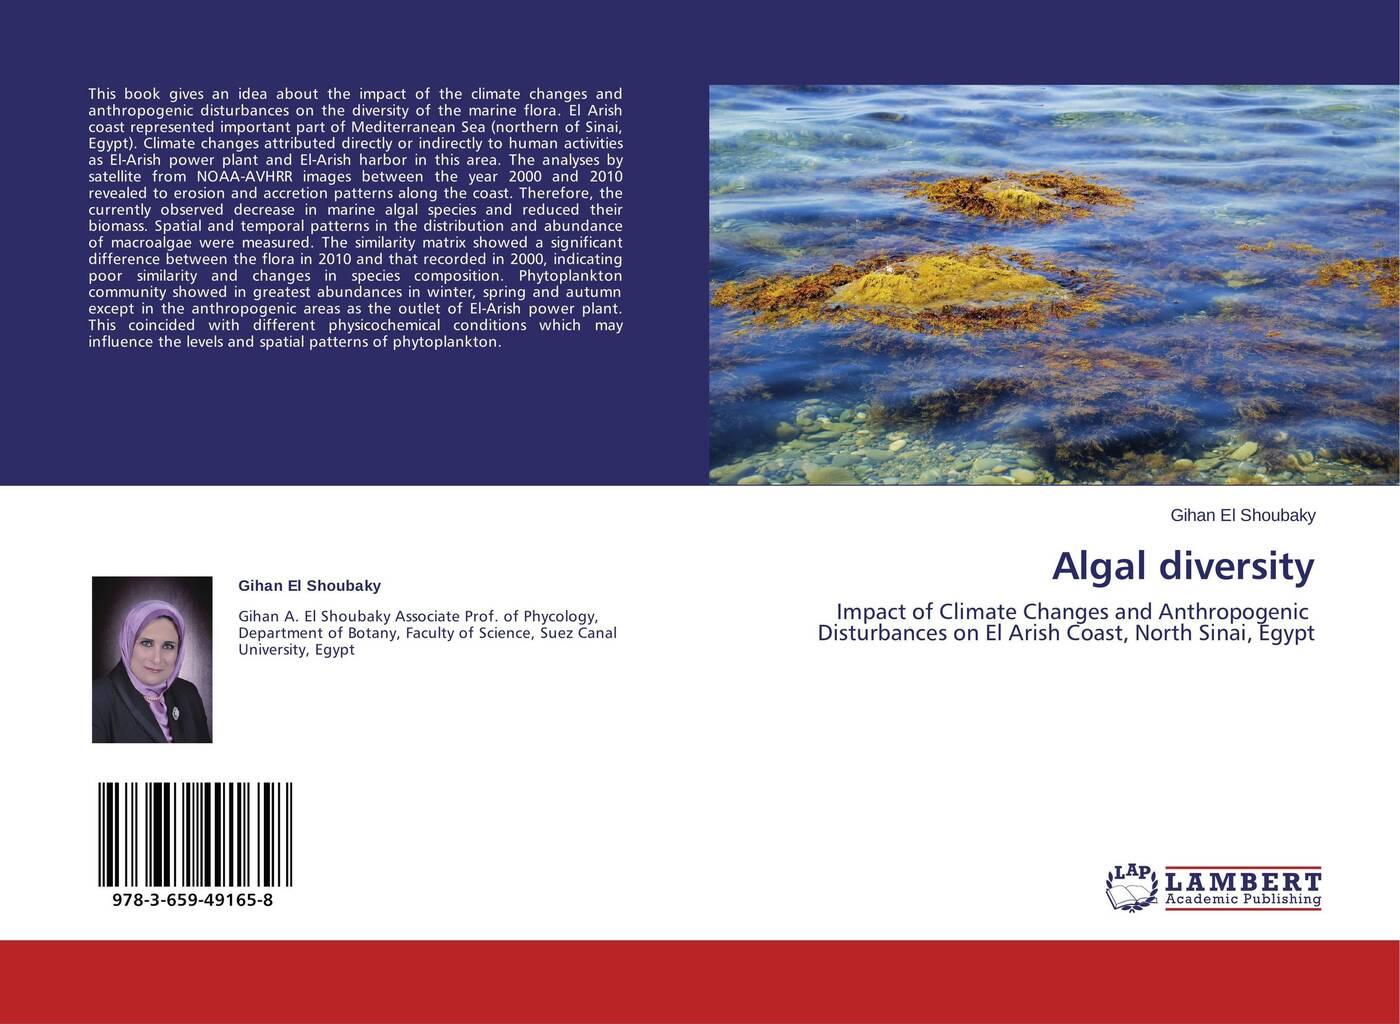 Gihan El Shoubaky Algal diversity algal diversity